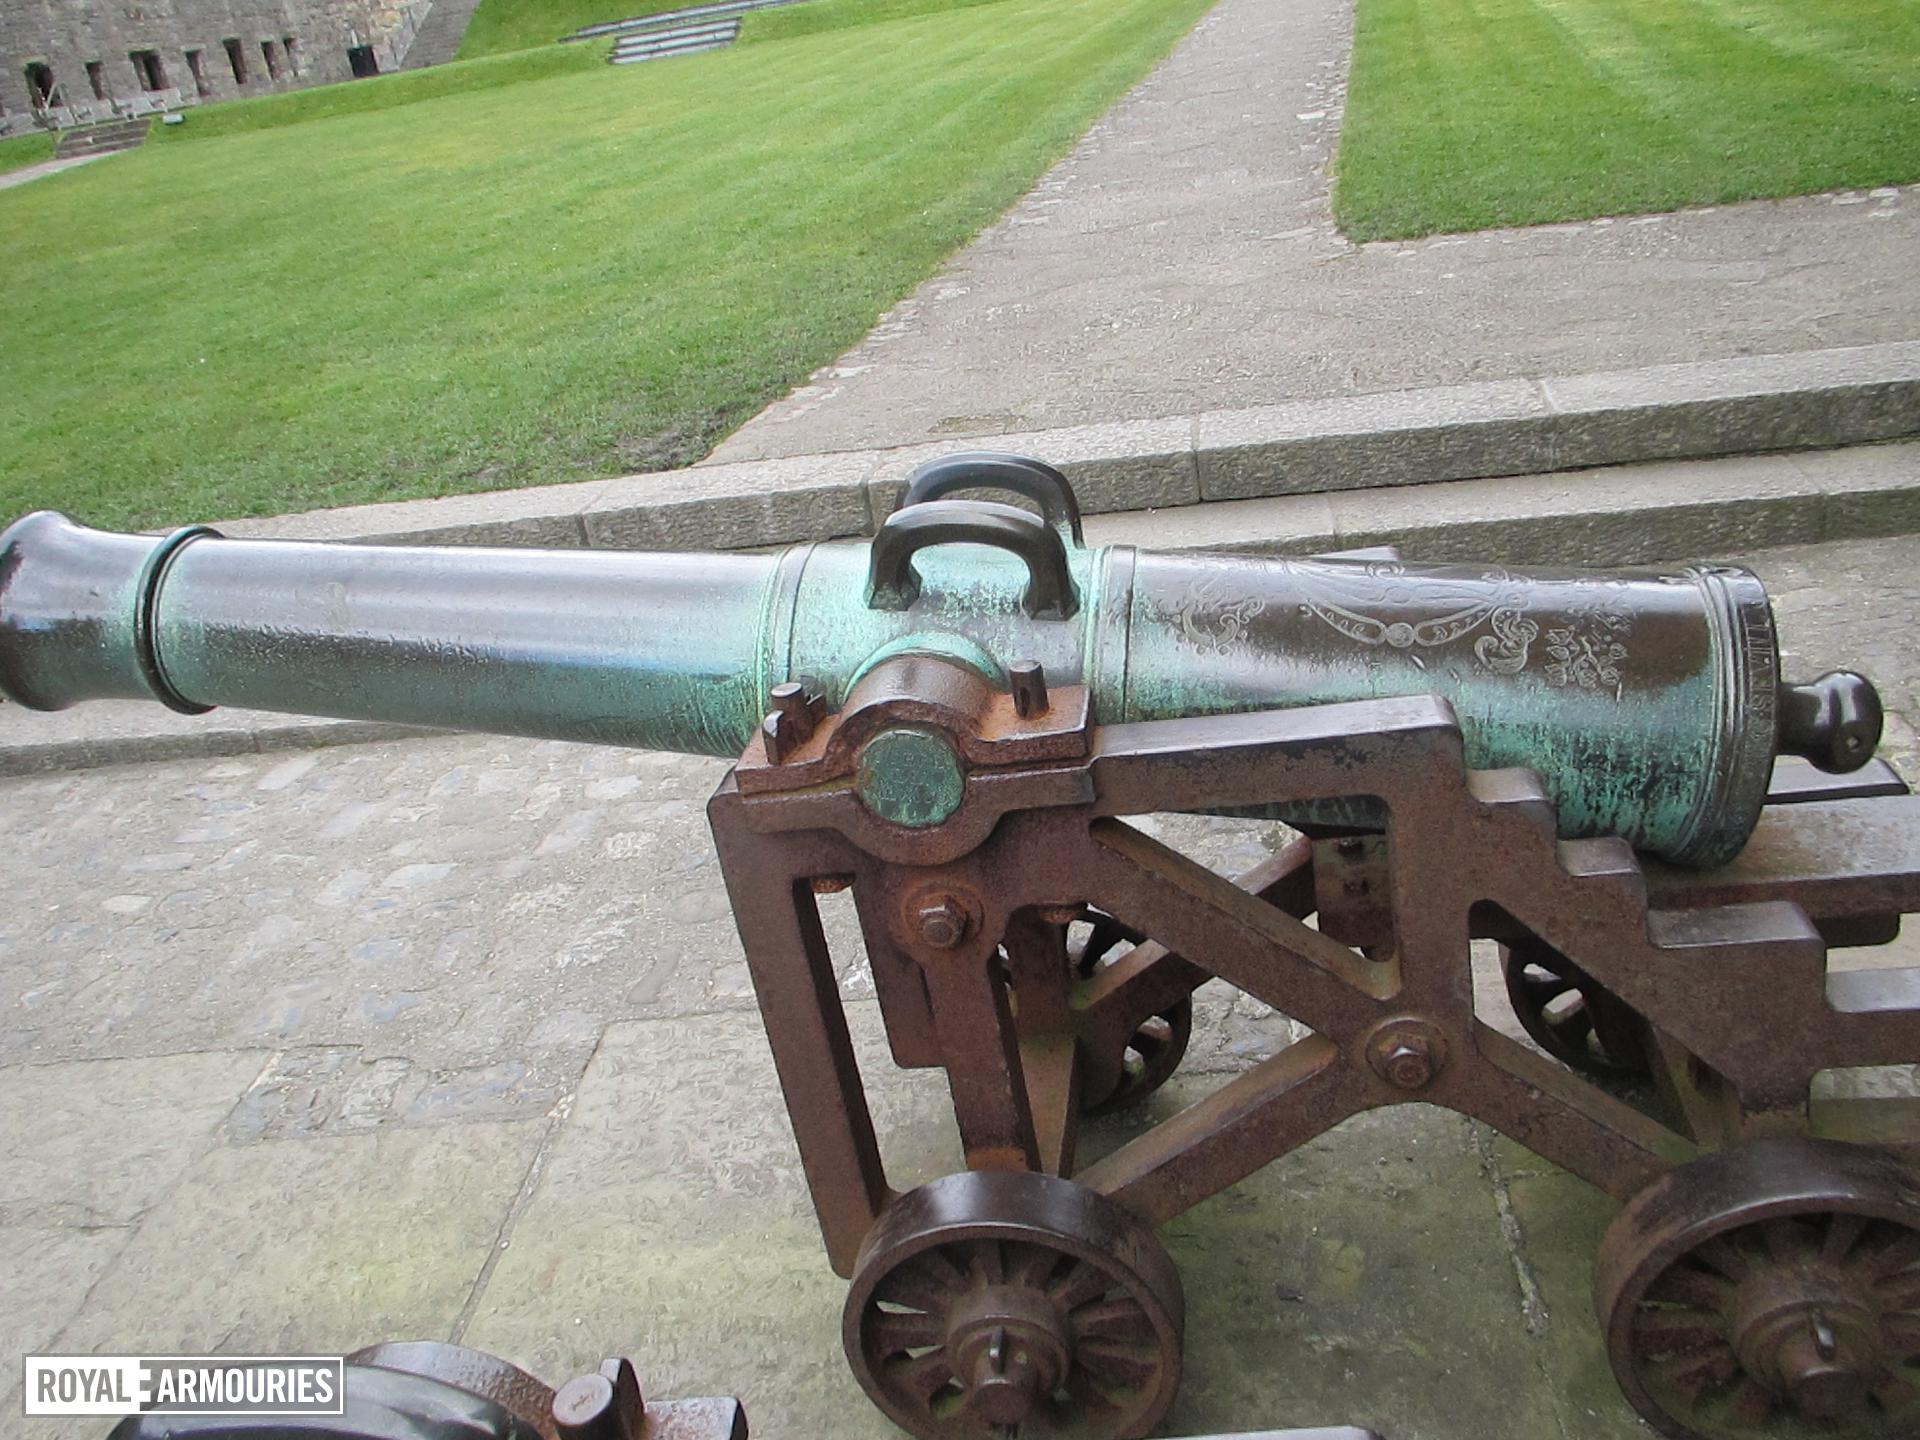 The gun on display at Caernarfon Castle.